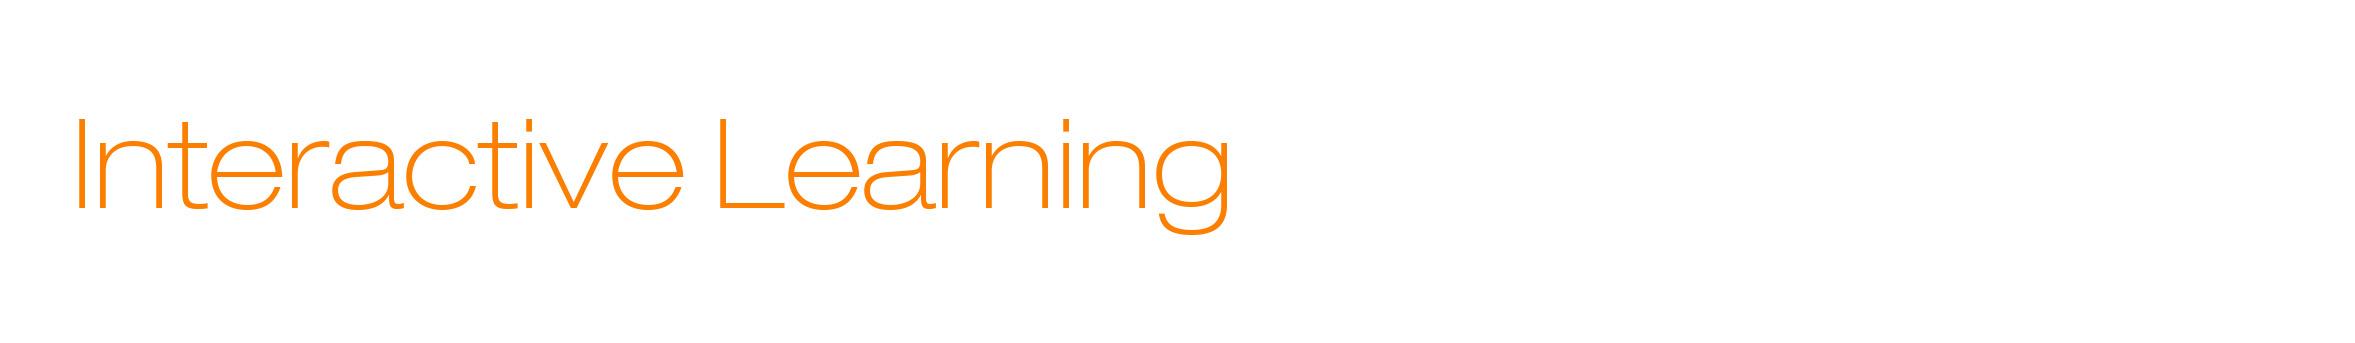 MM Sample E-learning - Interactive learning.jpg